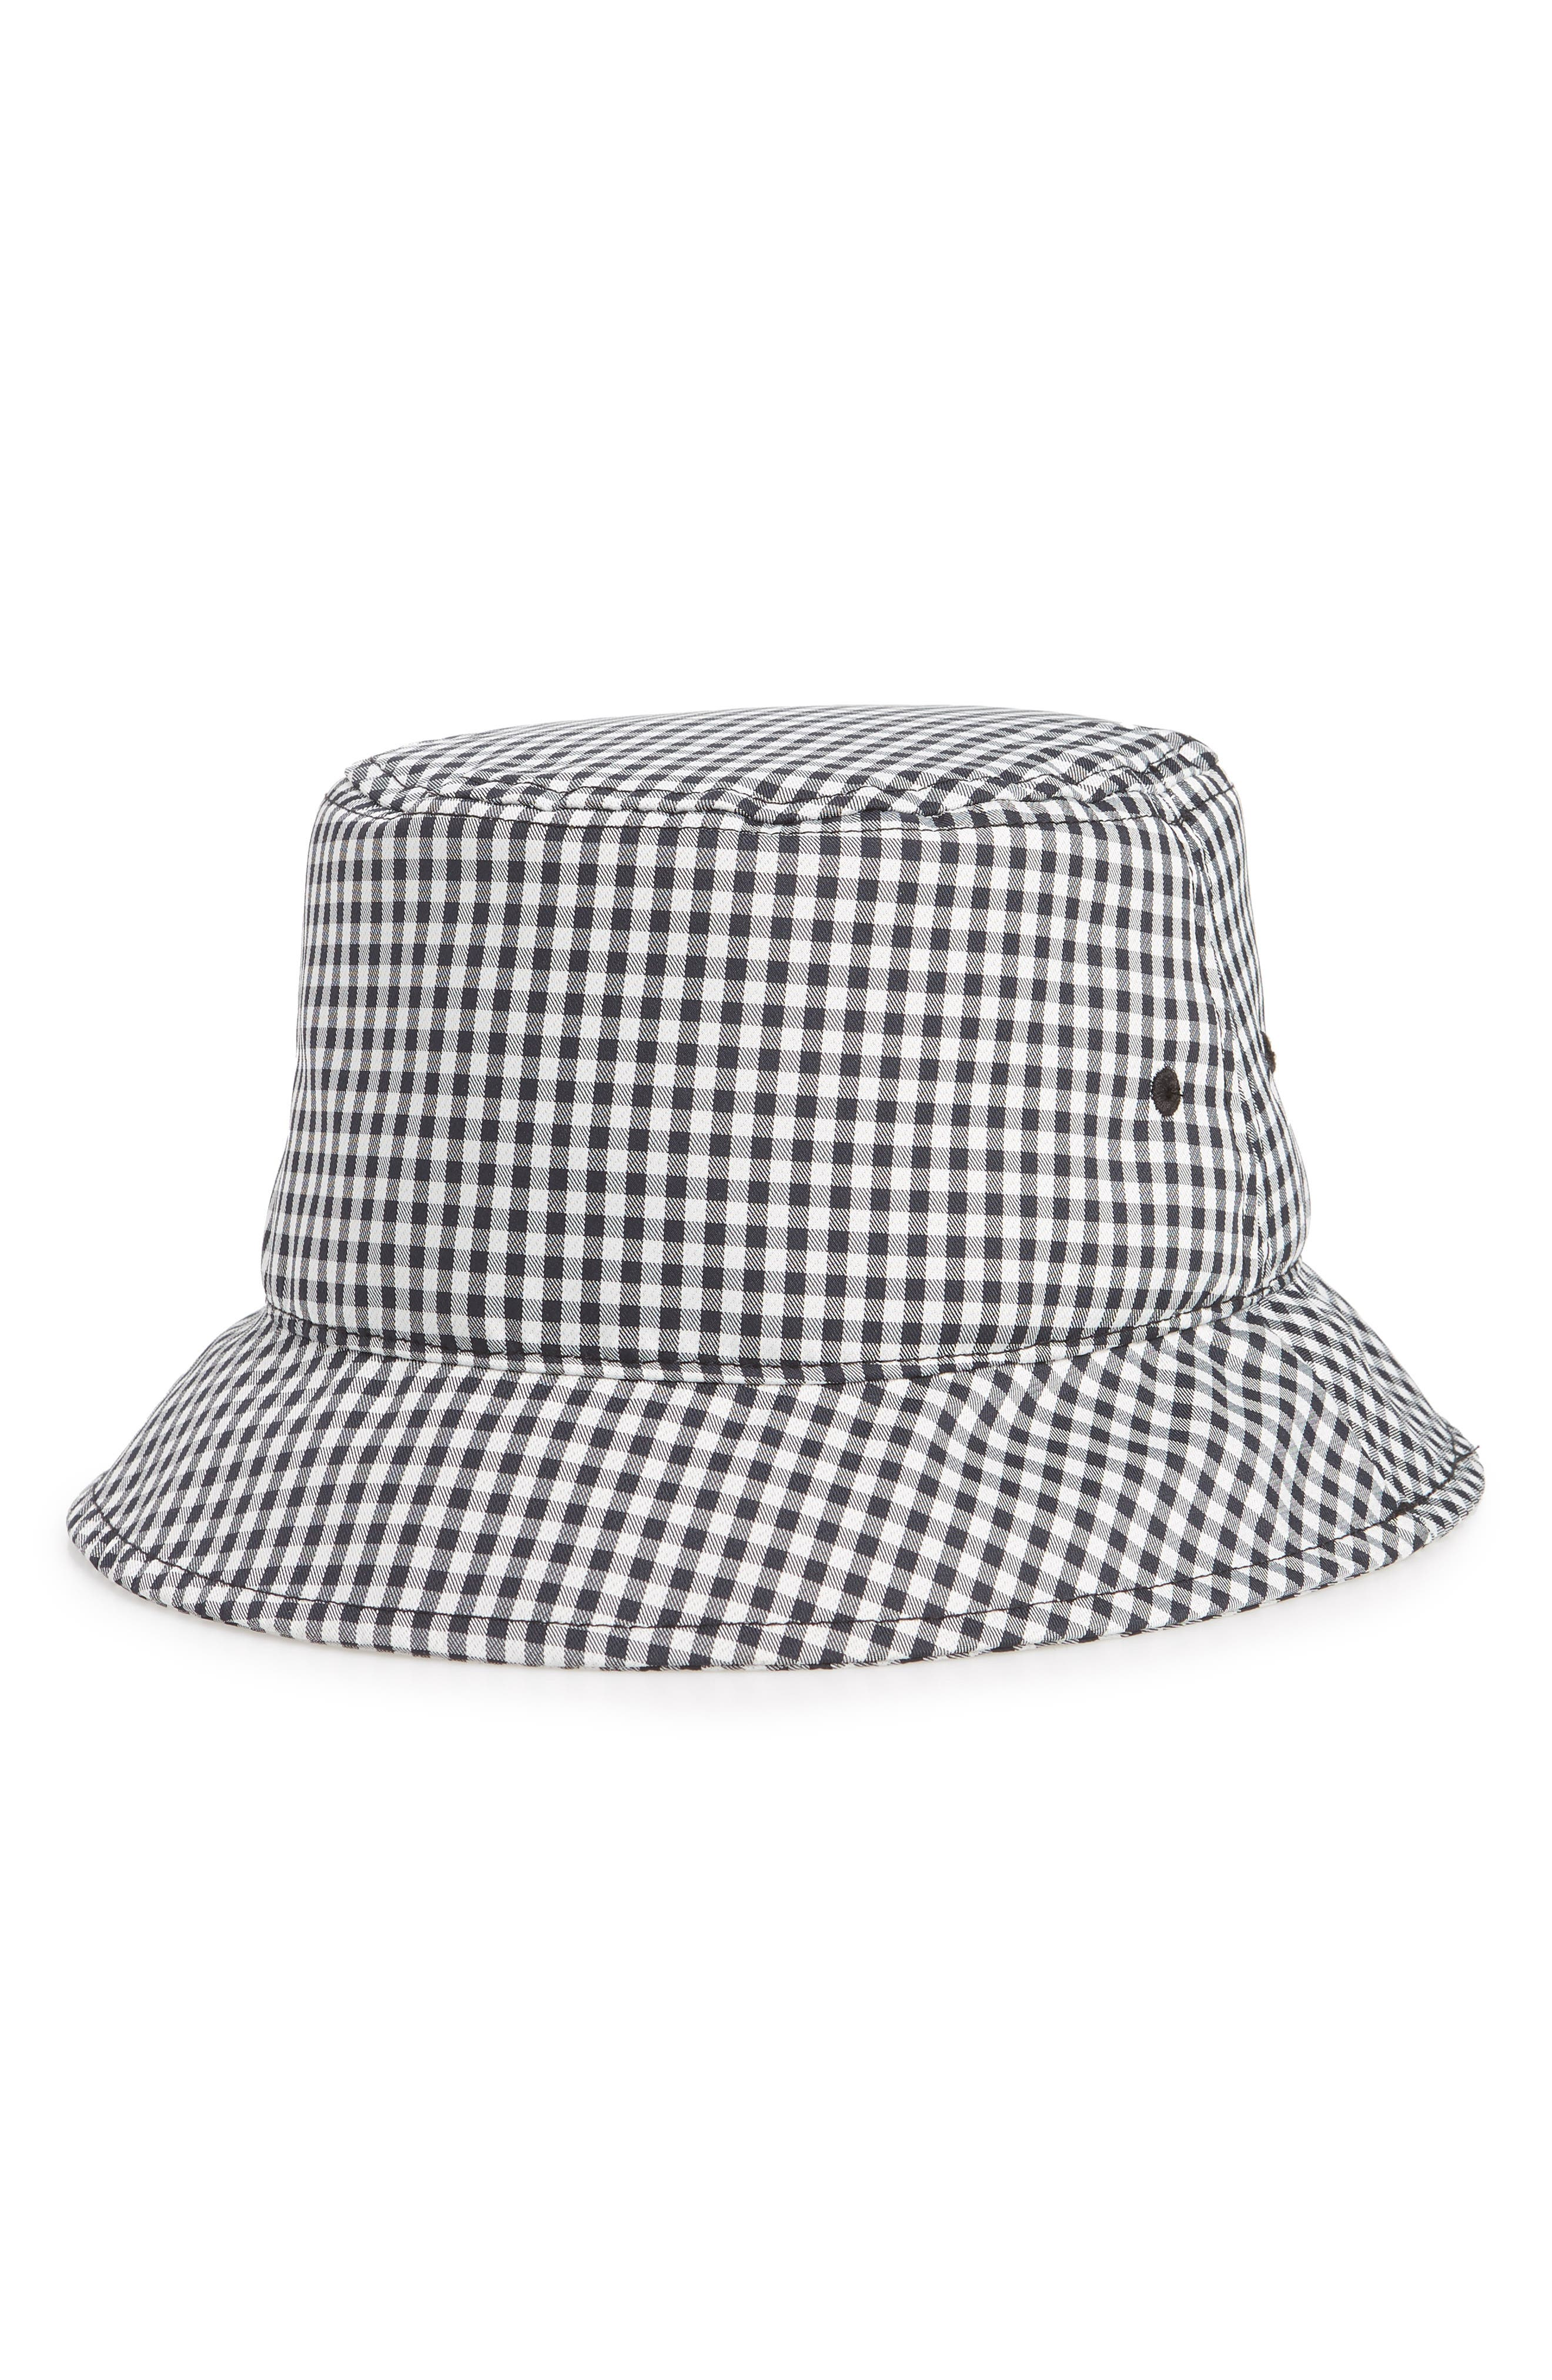 Ellis Bucket Hat,                             Main thumbnail 1, color,                             NAVY GINGHAM